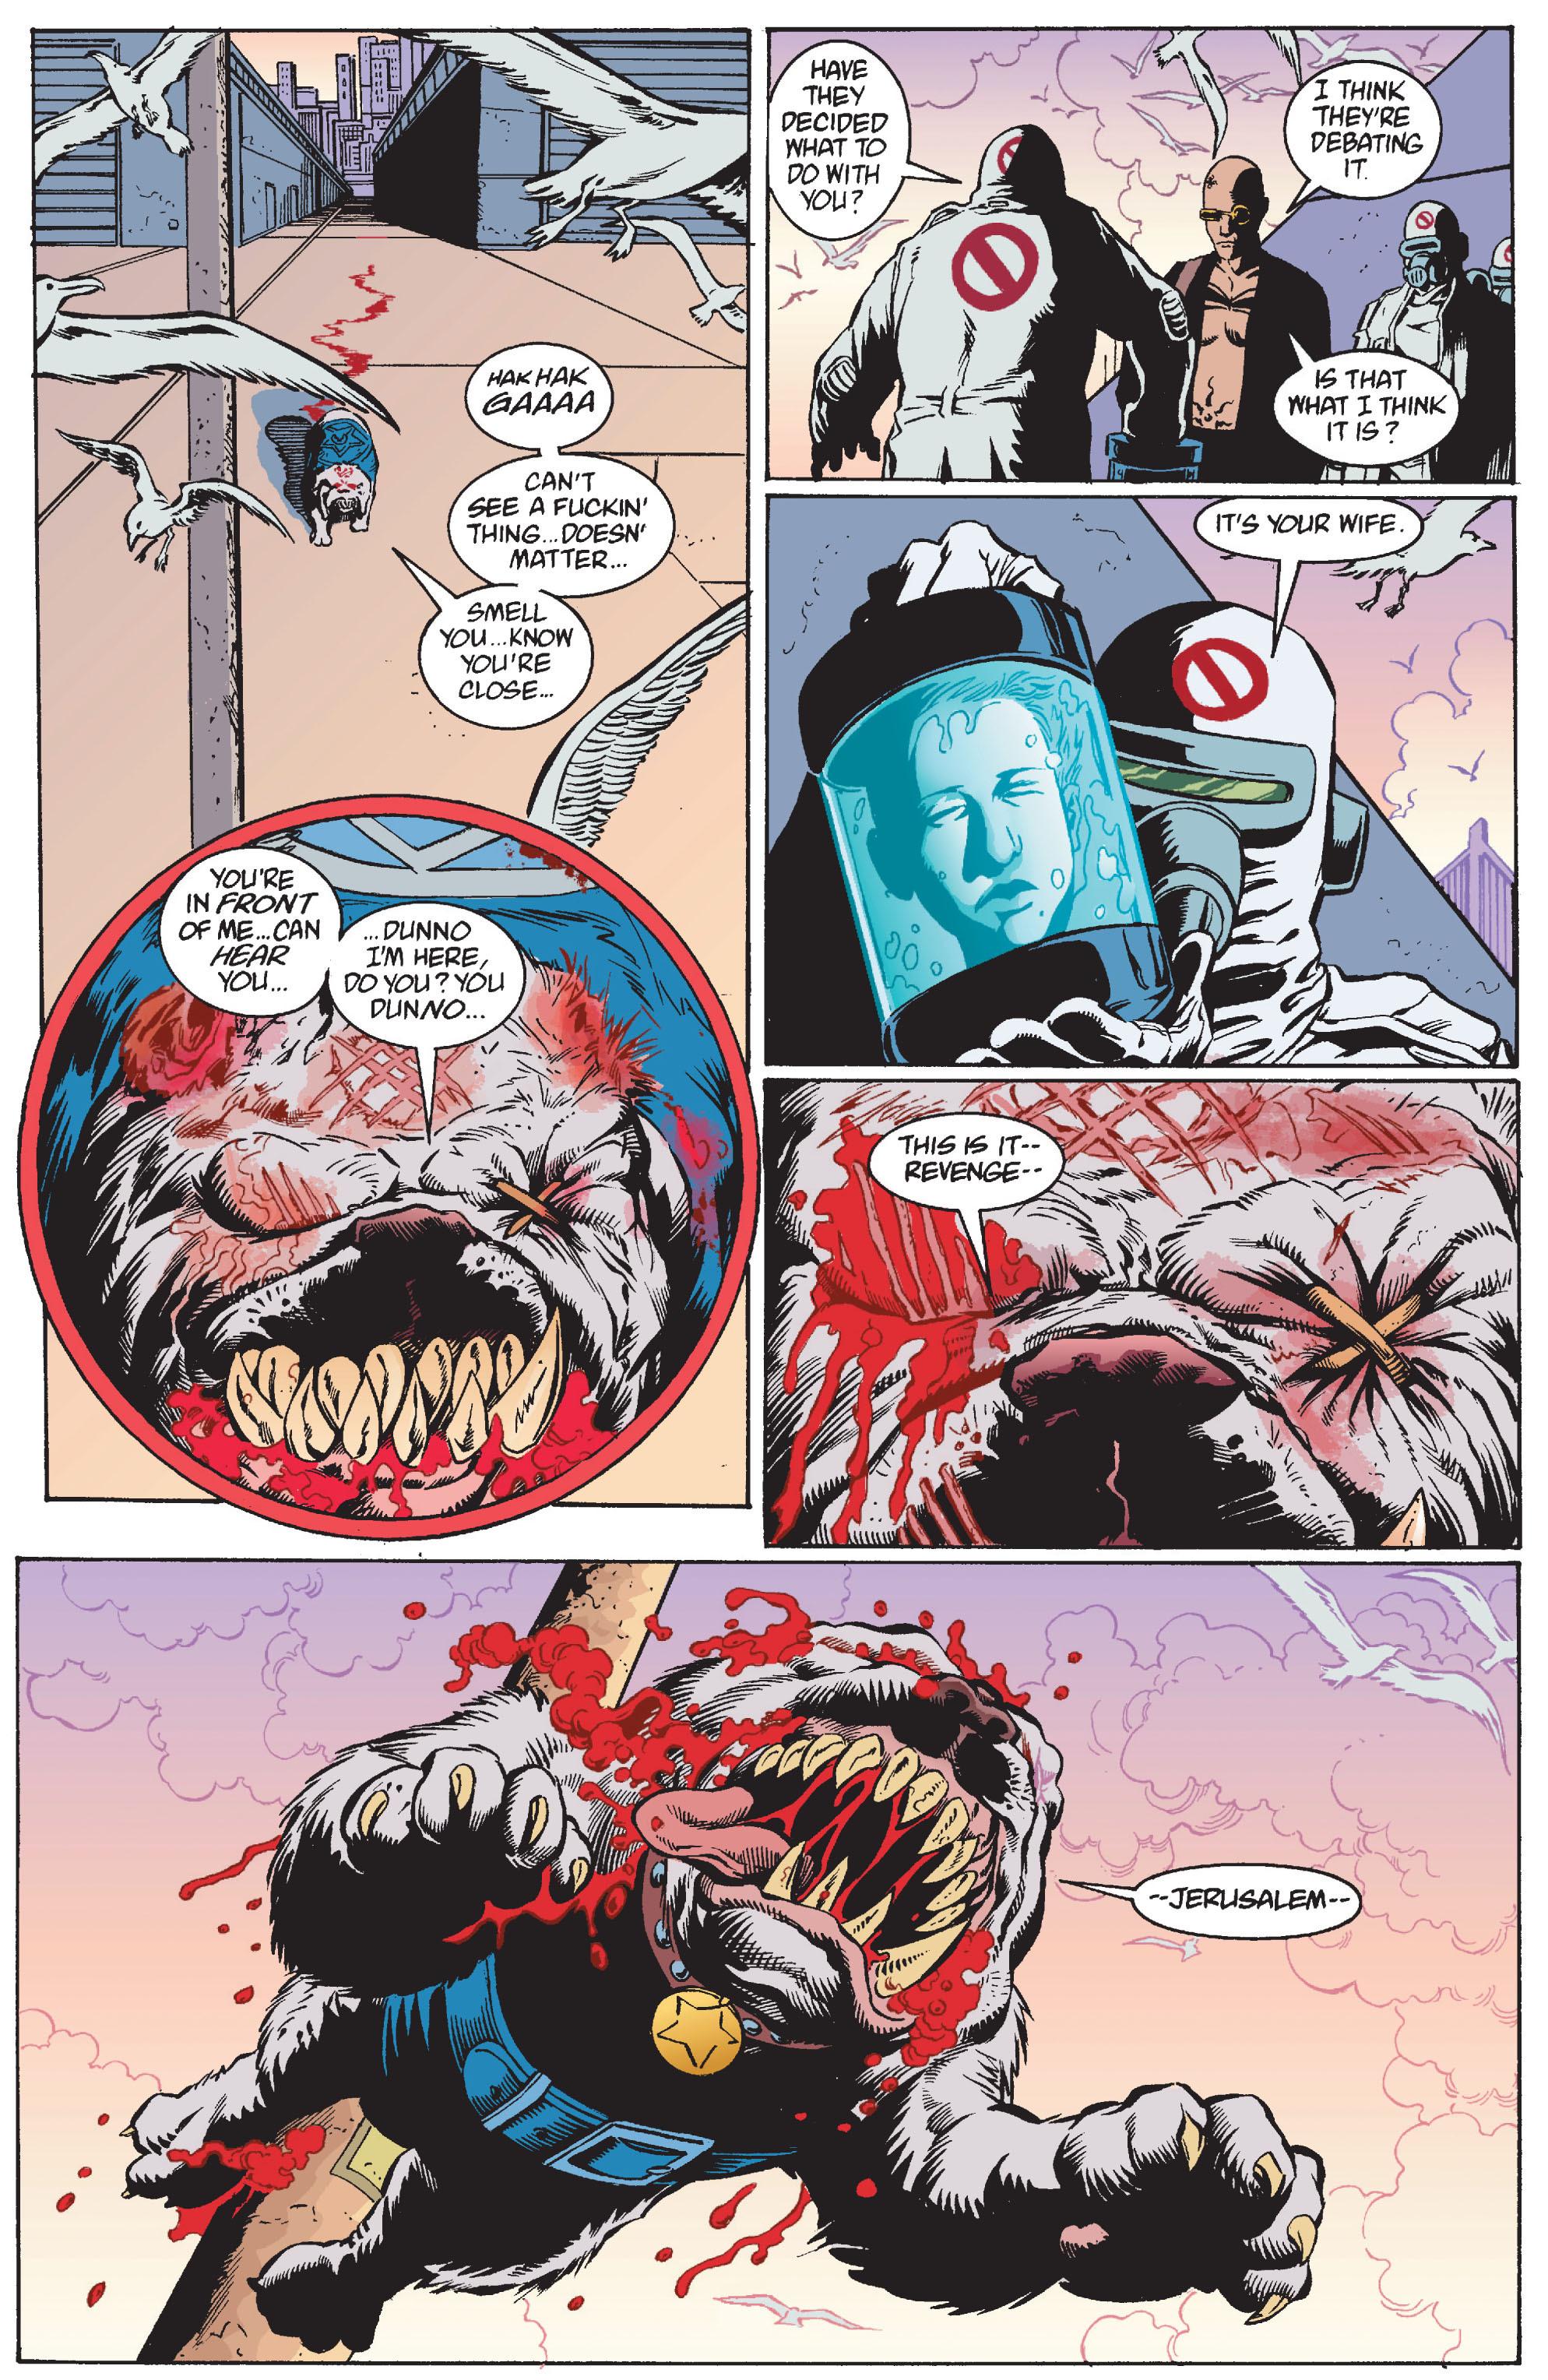 Read online Transmetropolitan comic -  Issue #12 - 18